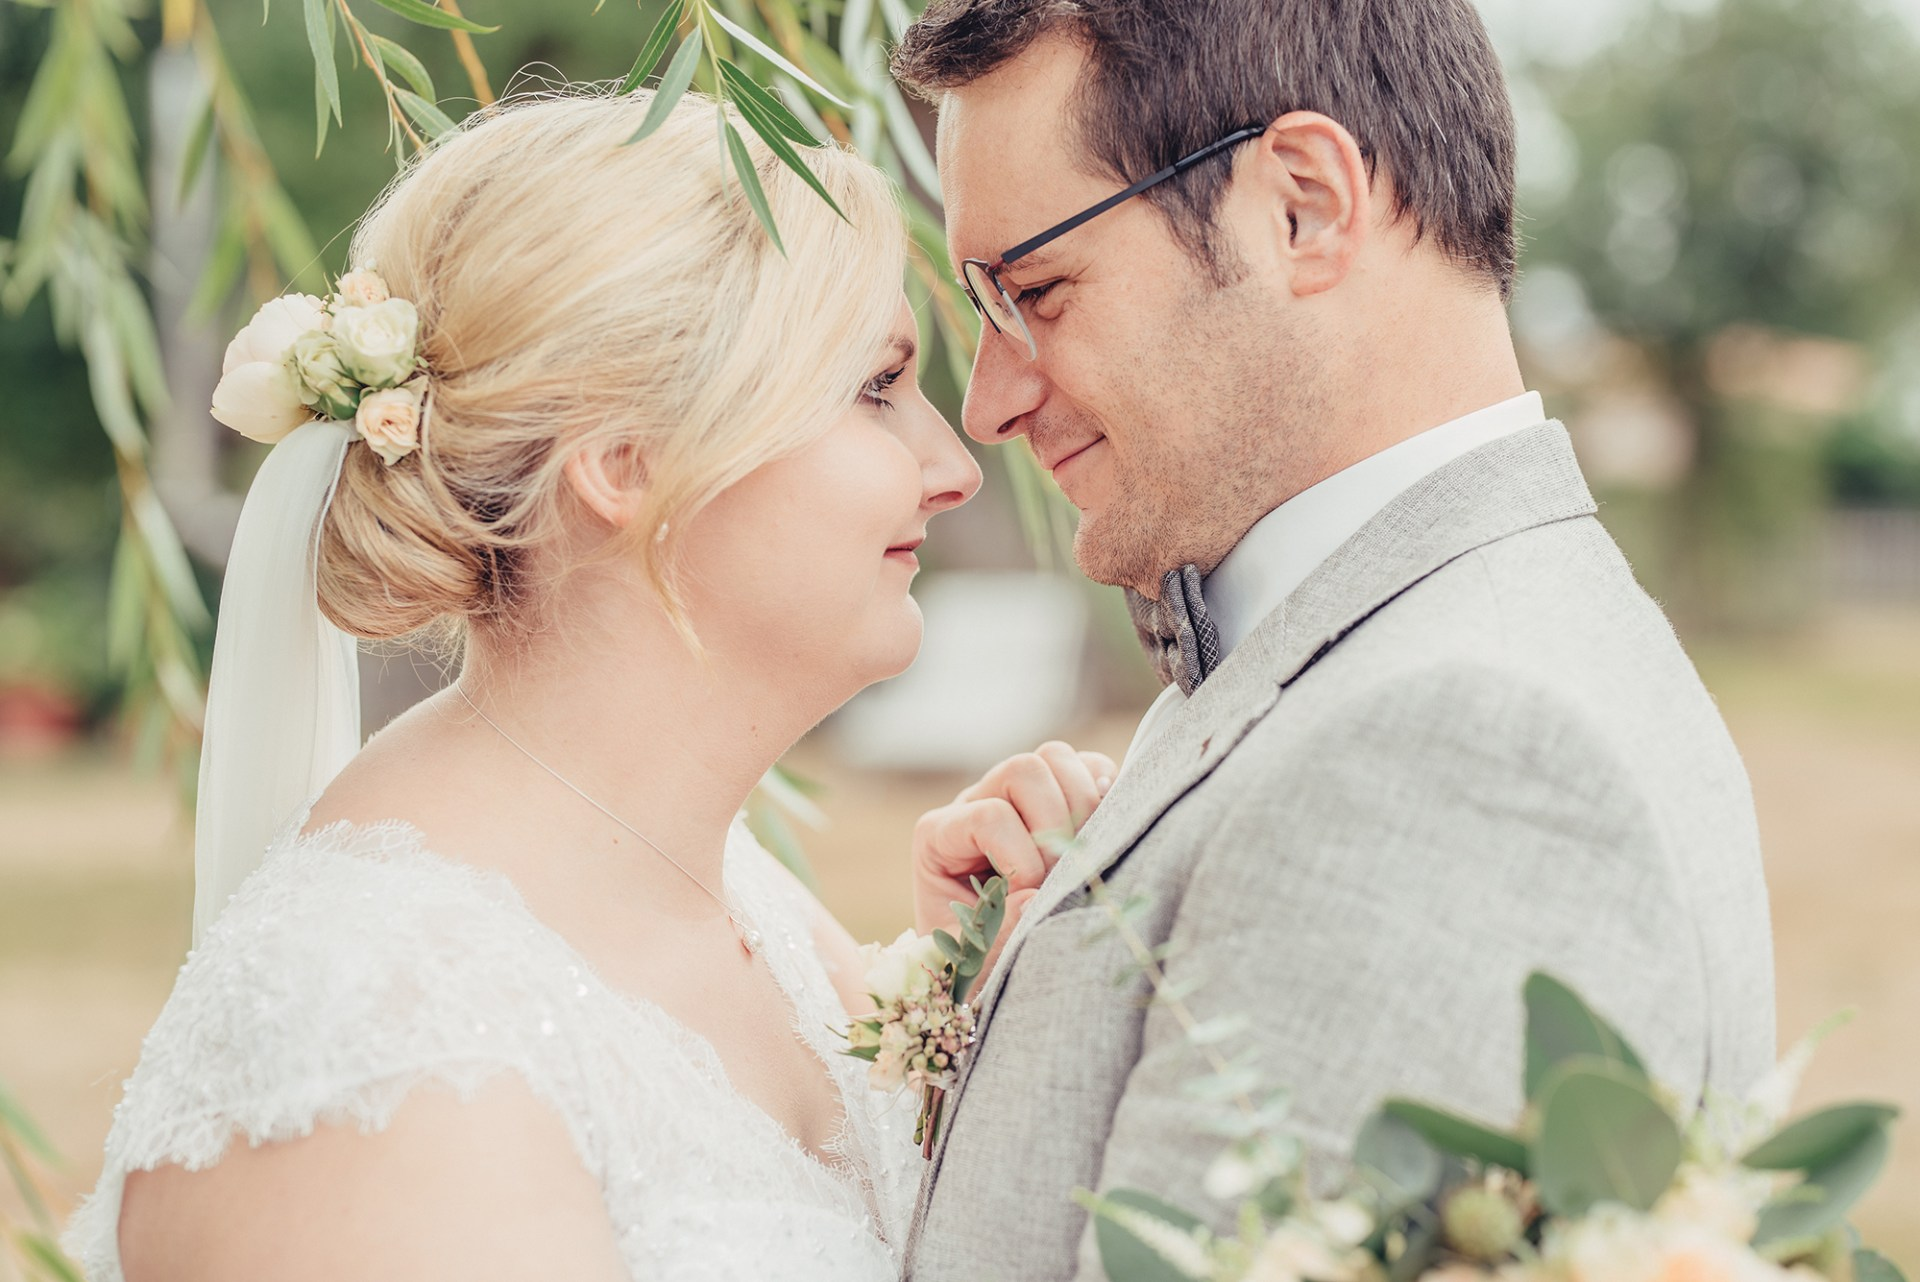 weddingseptemberluminoxx92348234155